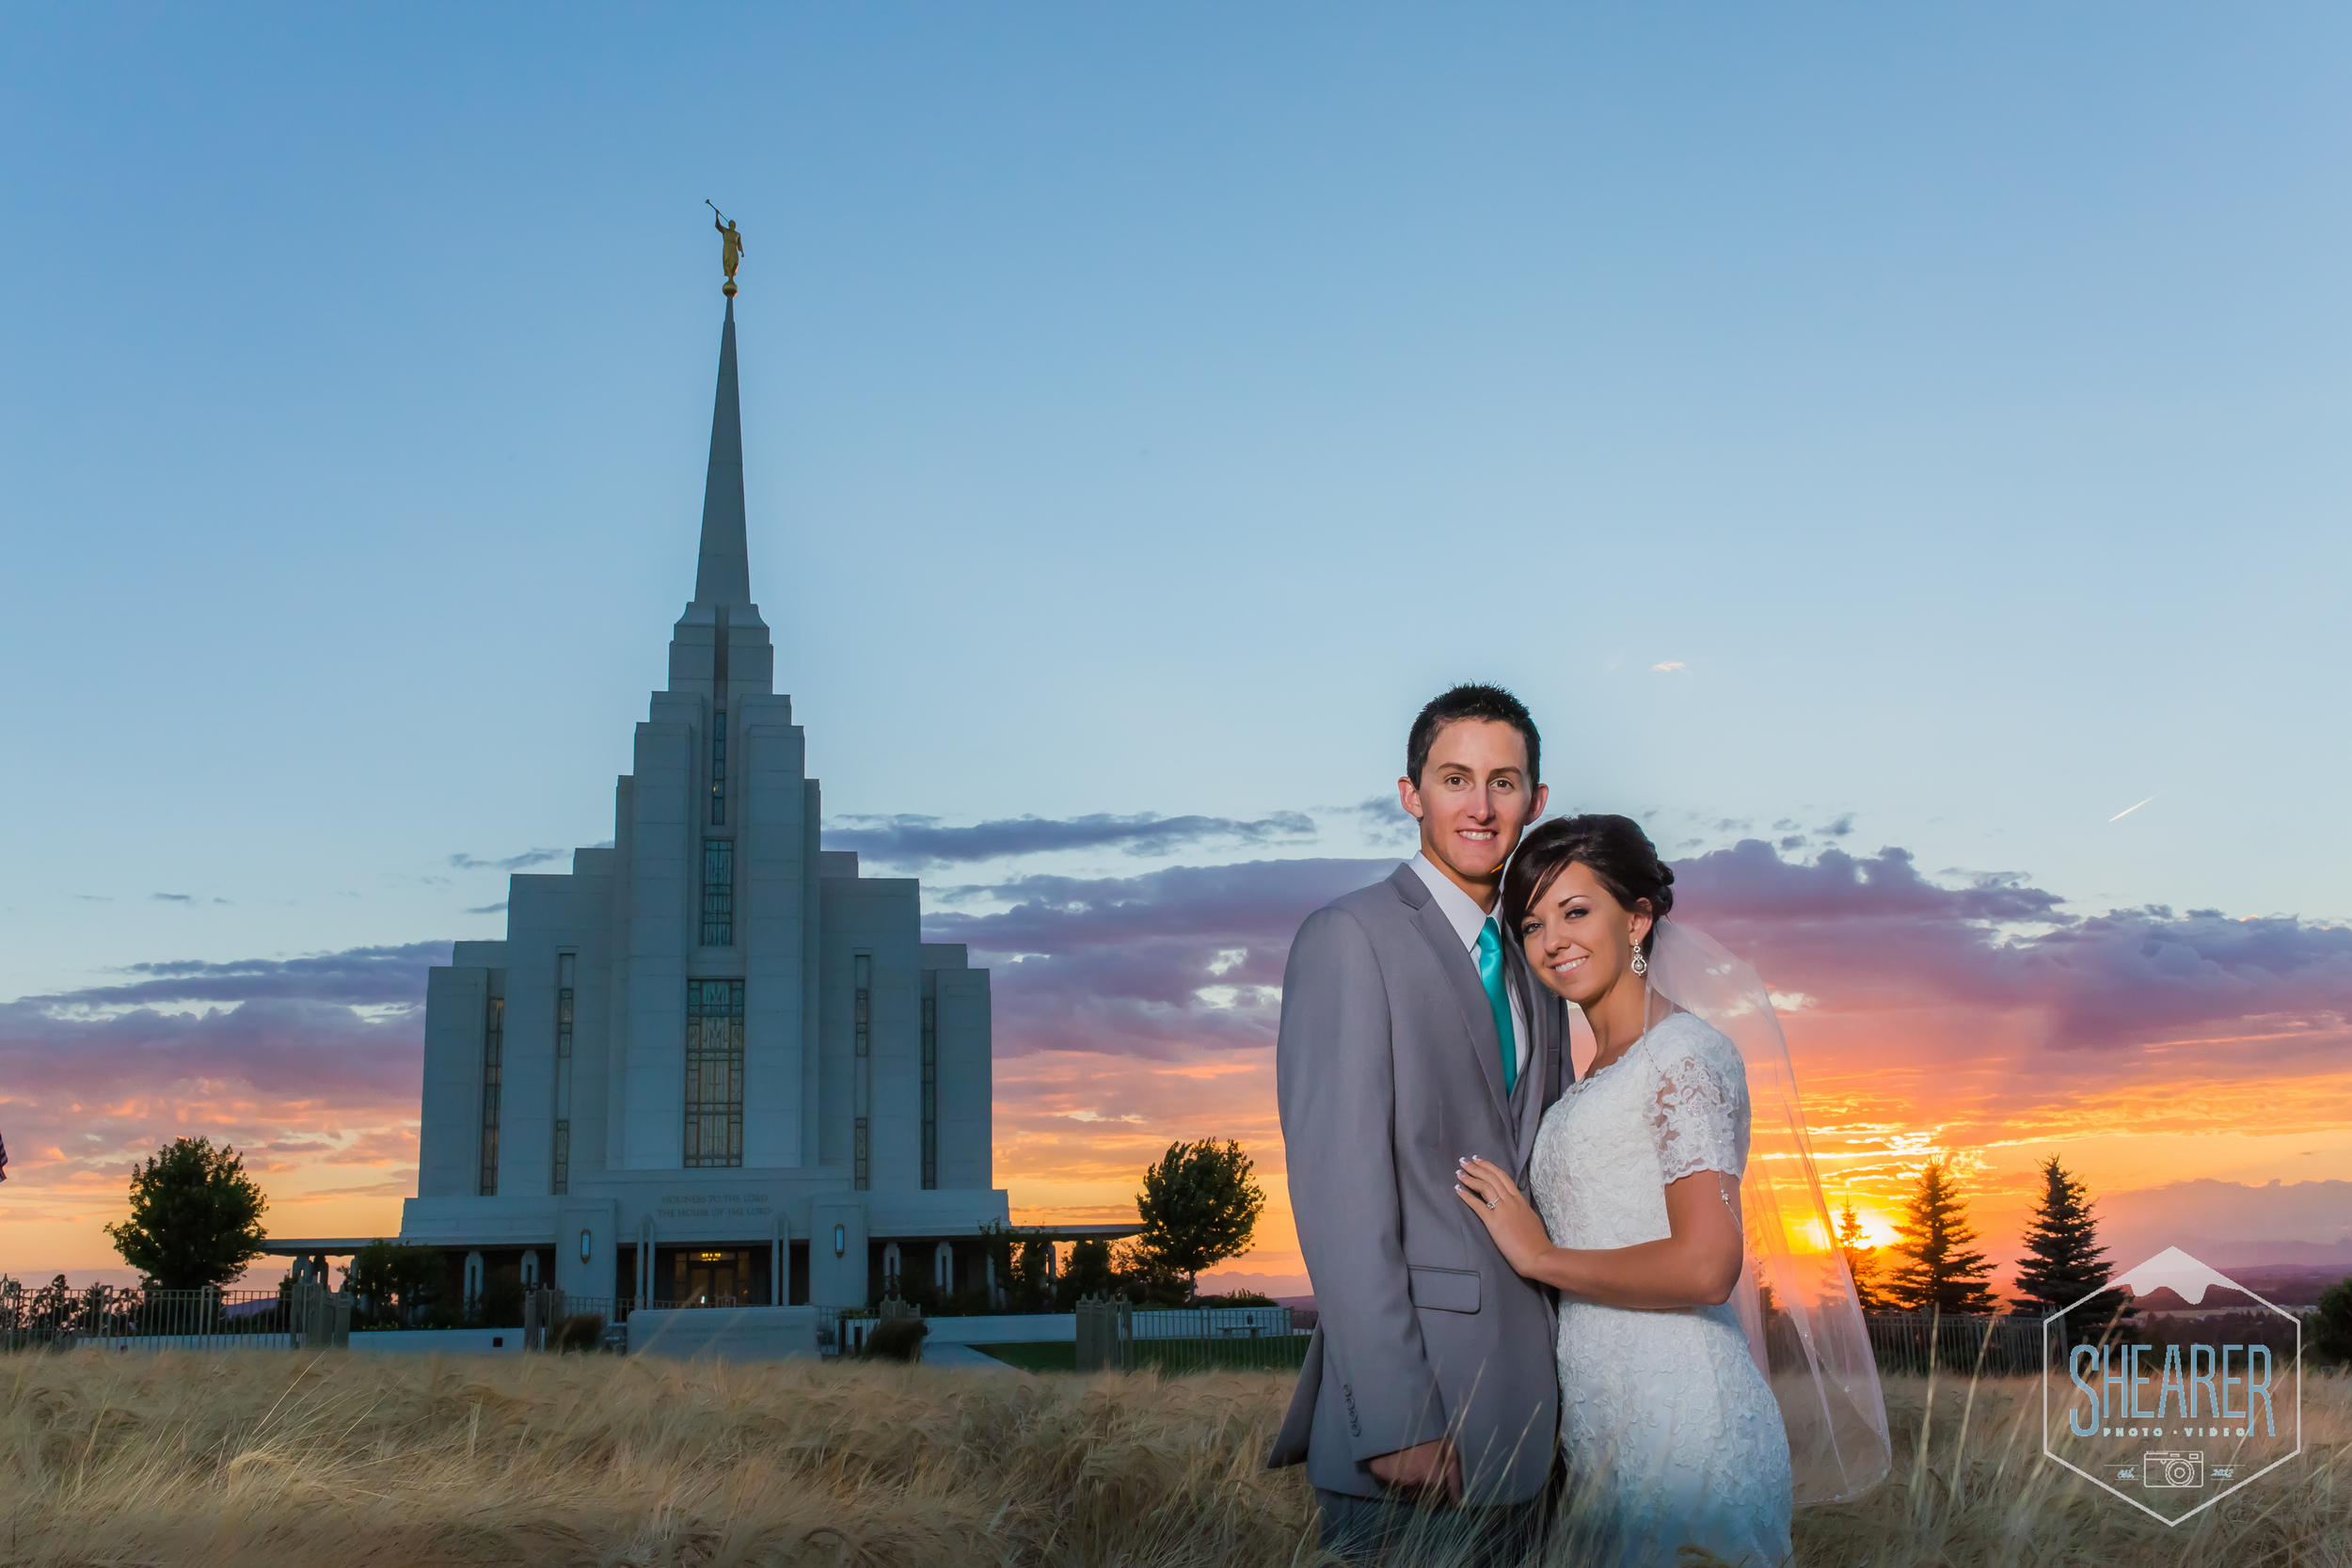 Tyler and Megin Shearer Photo and Video Kayla and Colton bridals wedding rexburg idaho-291.jpg